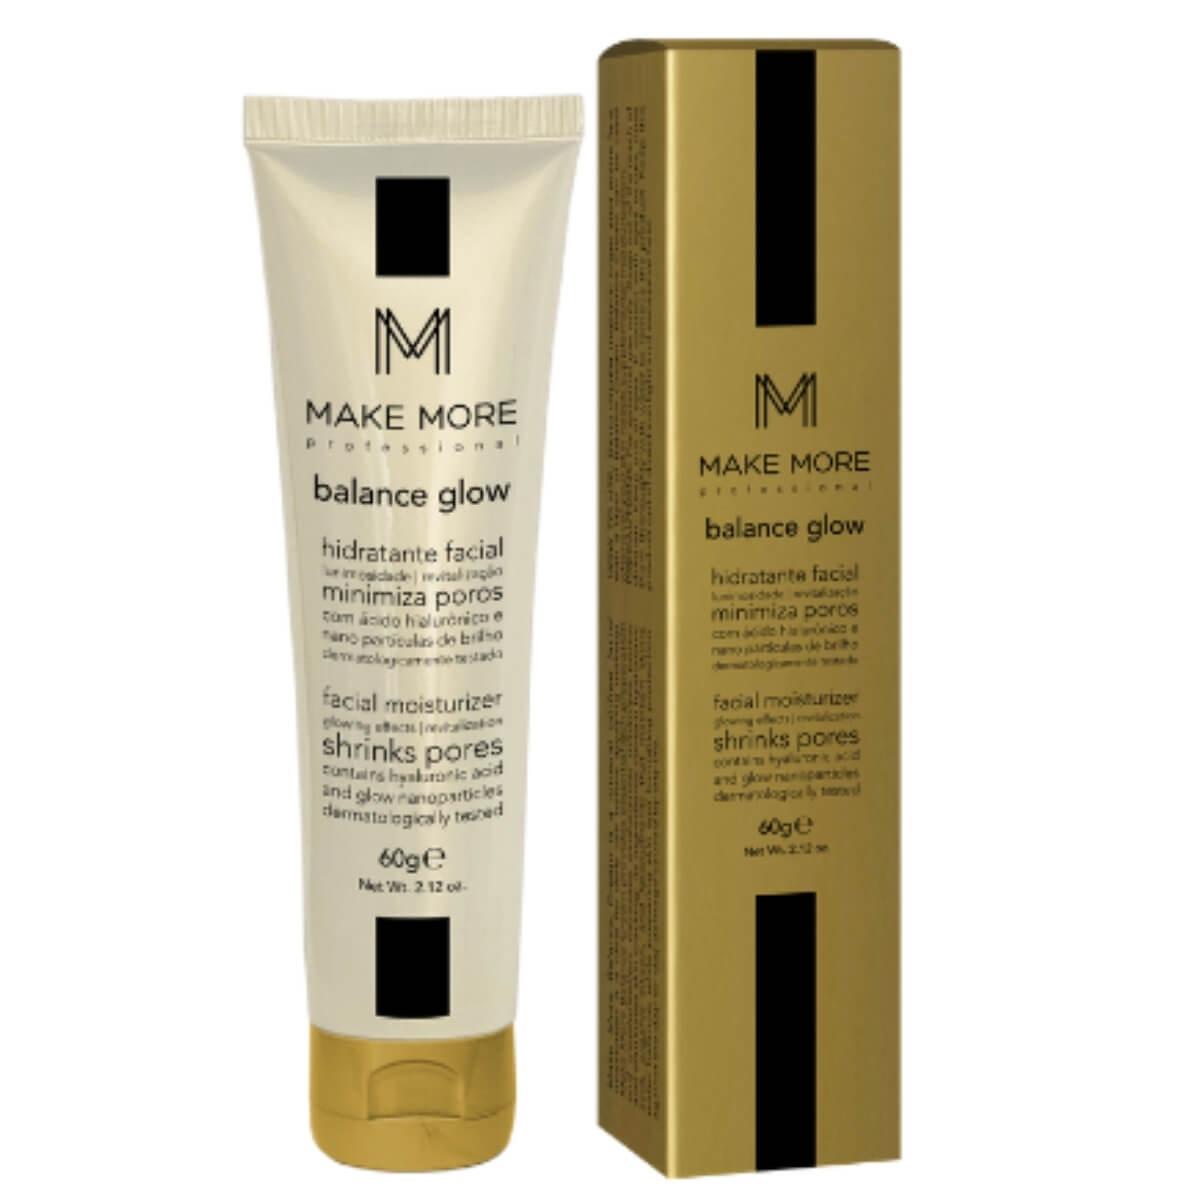 Hidratante Facial Balance Glow 60g - Make More